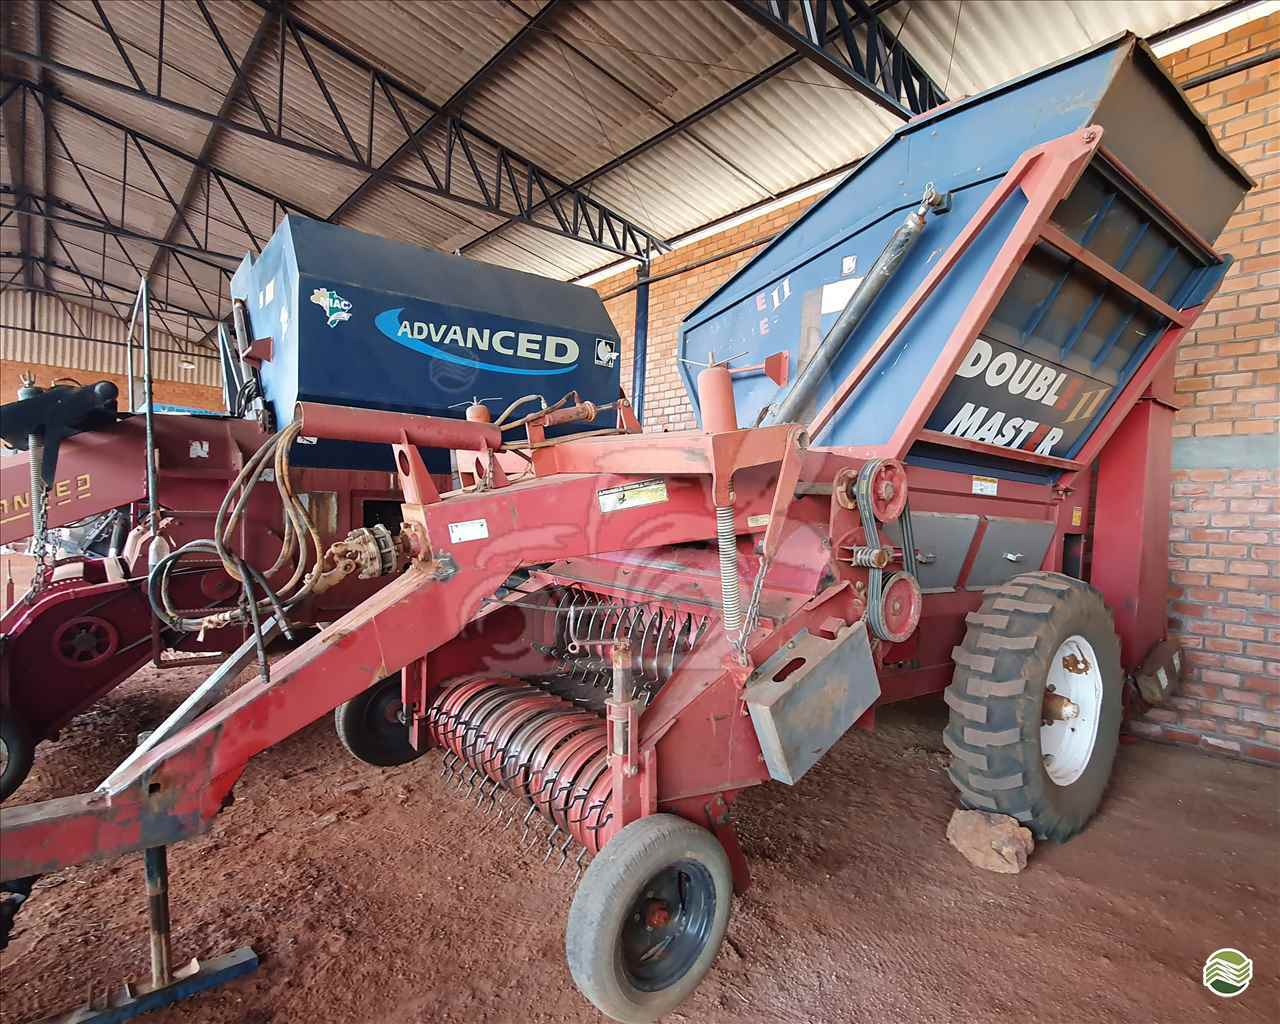 IMPLEMENTOS AGRICOLAS COLHEDORAS MIAC DOUBLE MASTER II EP Máquinas e Implementos Agrícolas CRISTALINA GOIAS GO